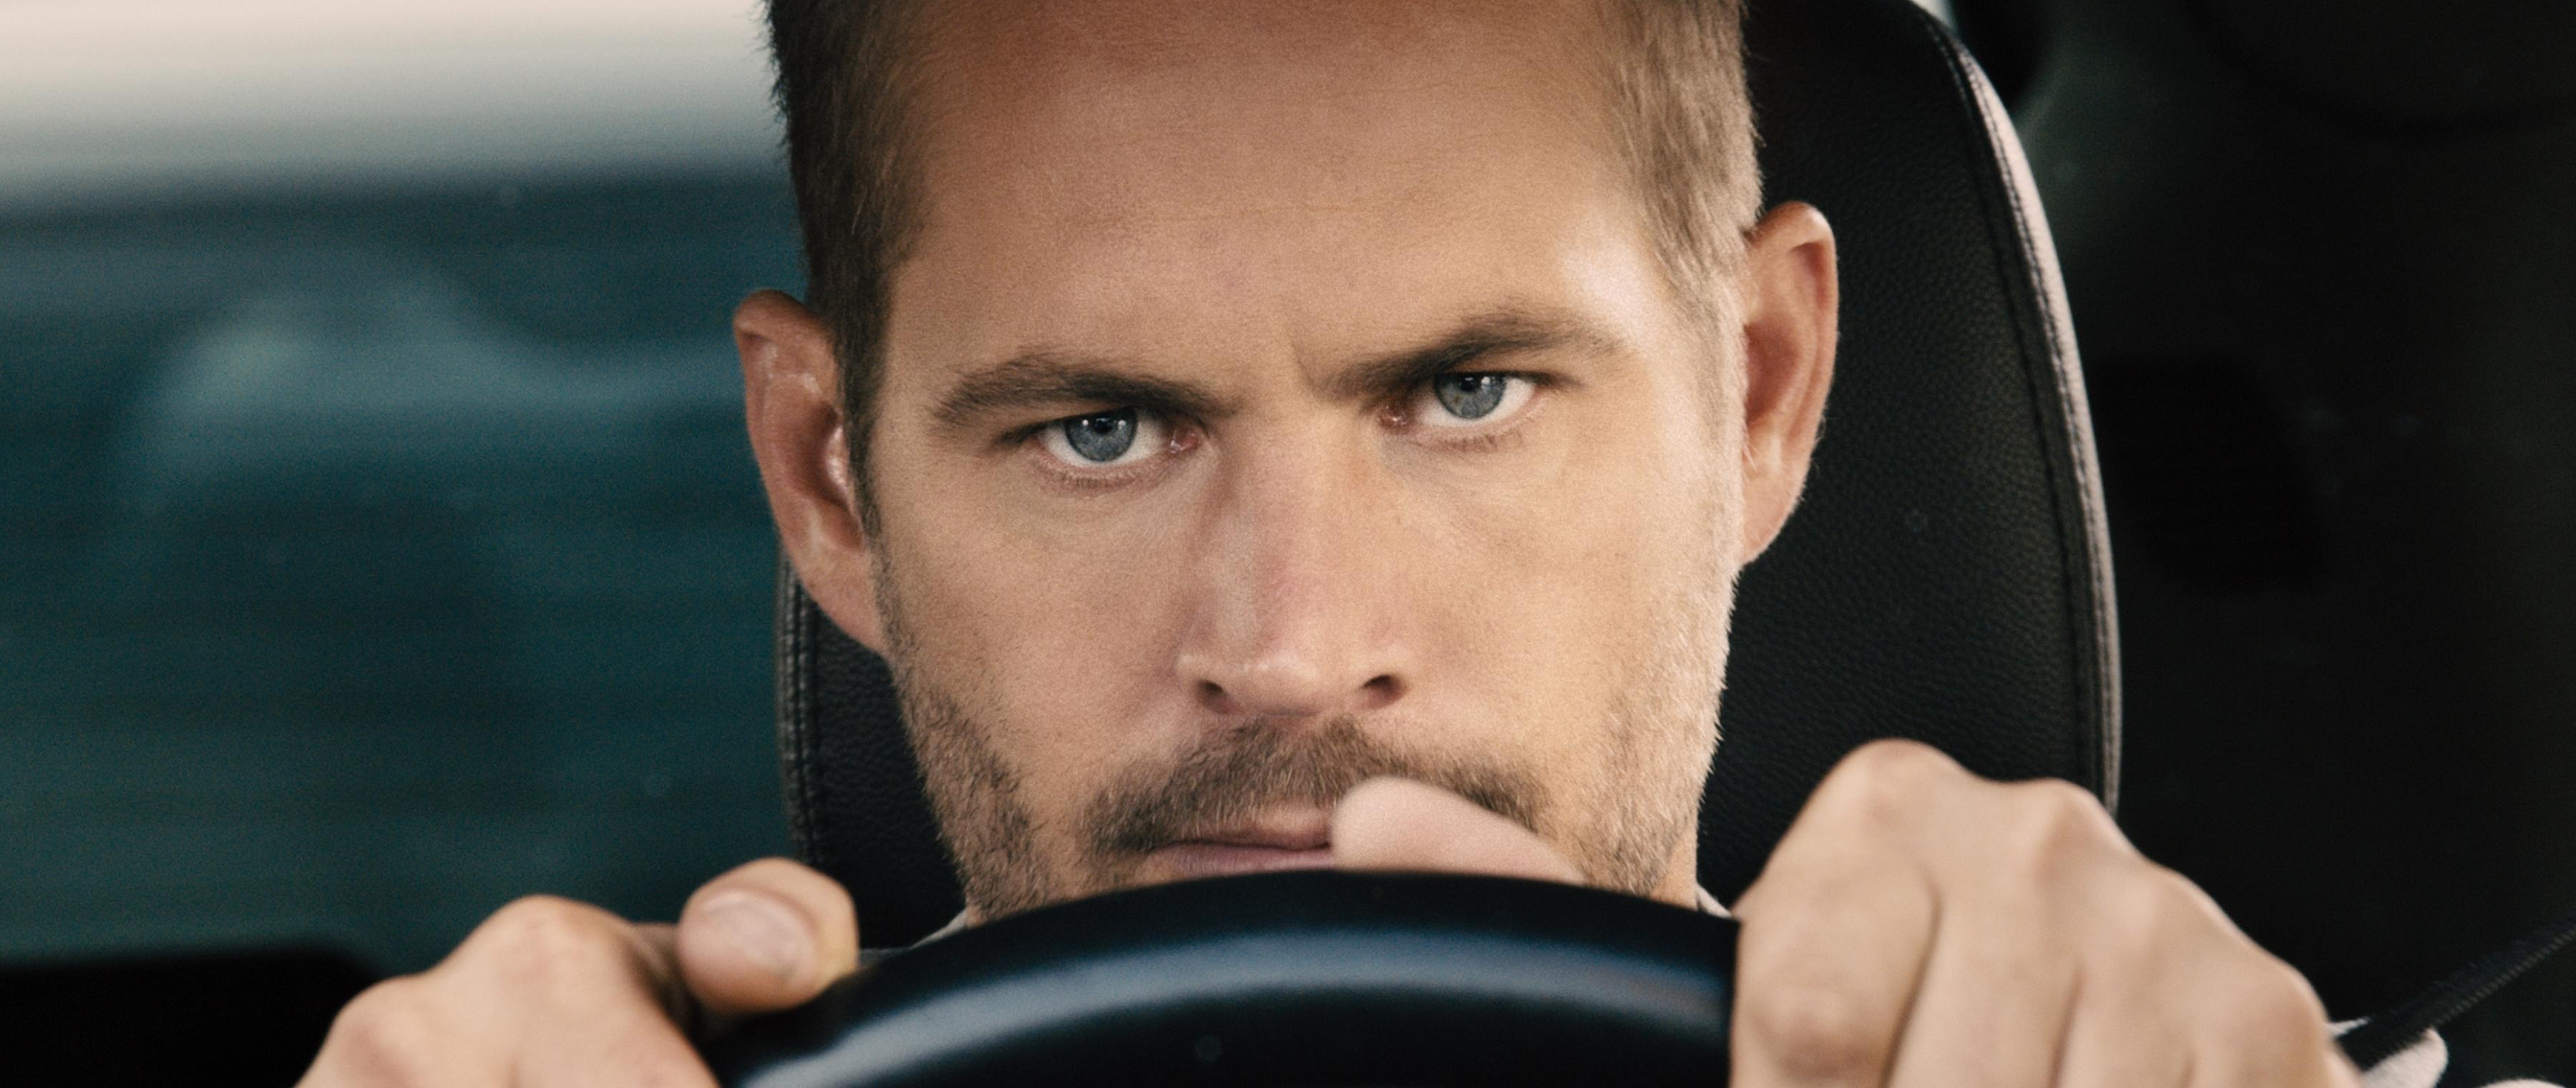 'Furious 7': CGI Version of Paul Walker Slammed On Twitter